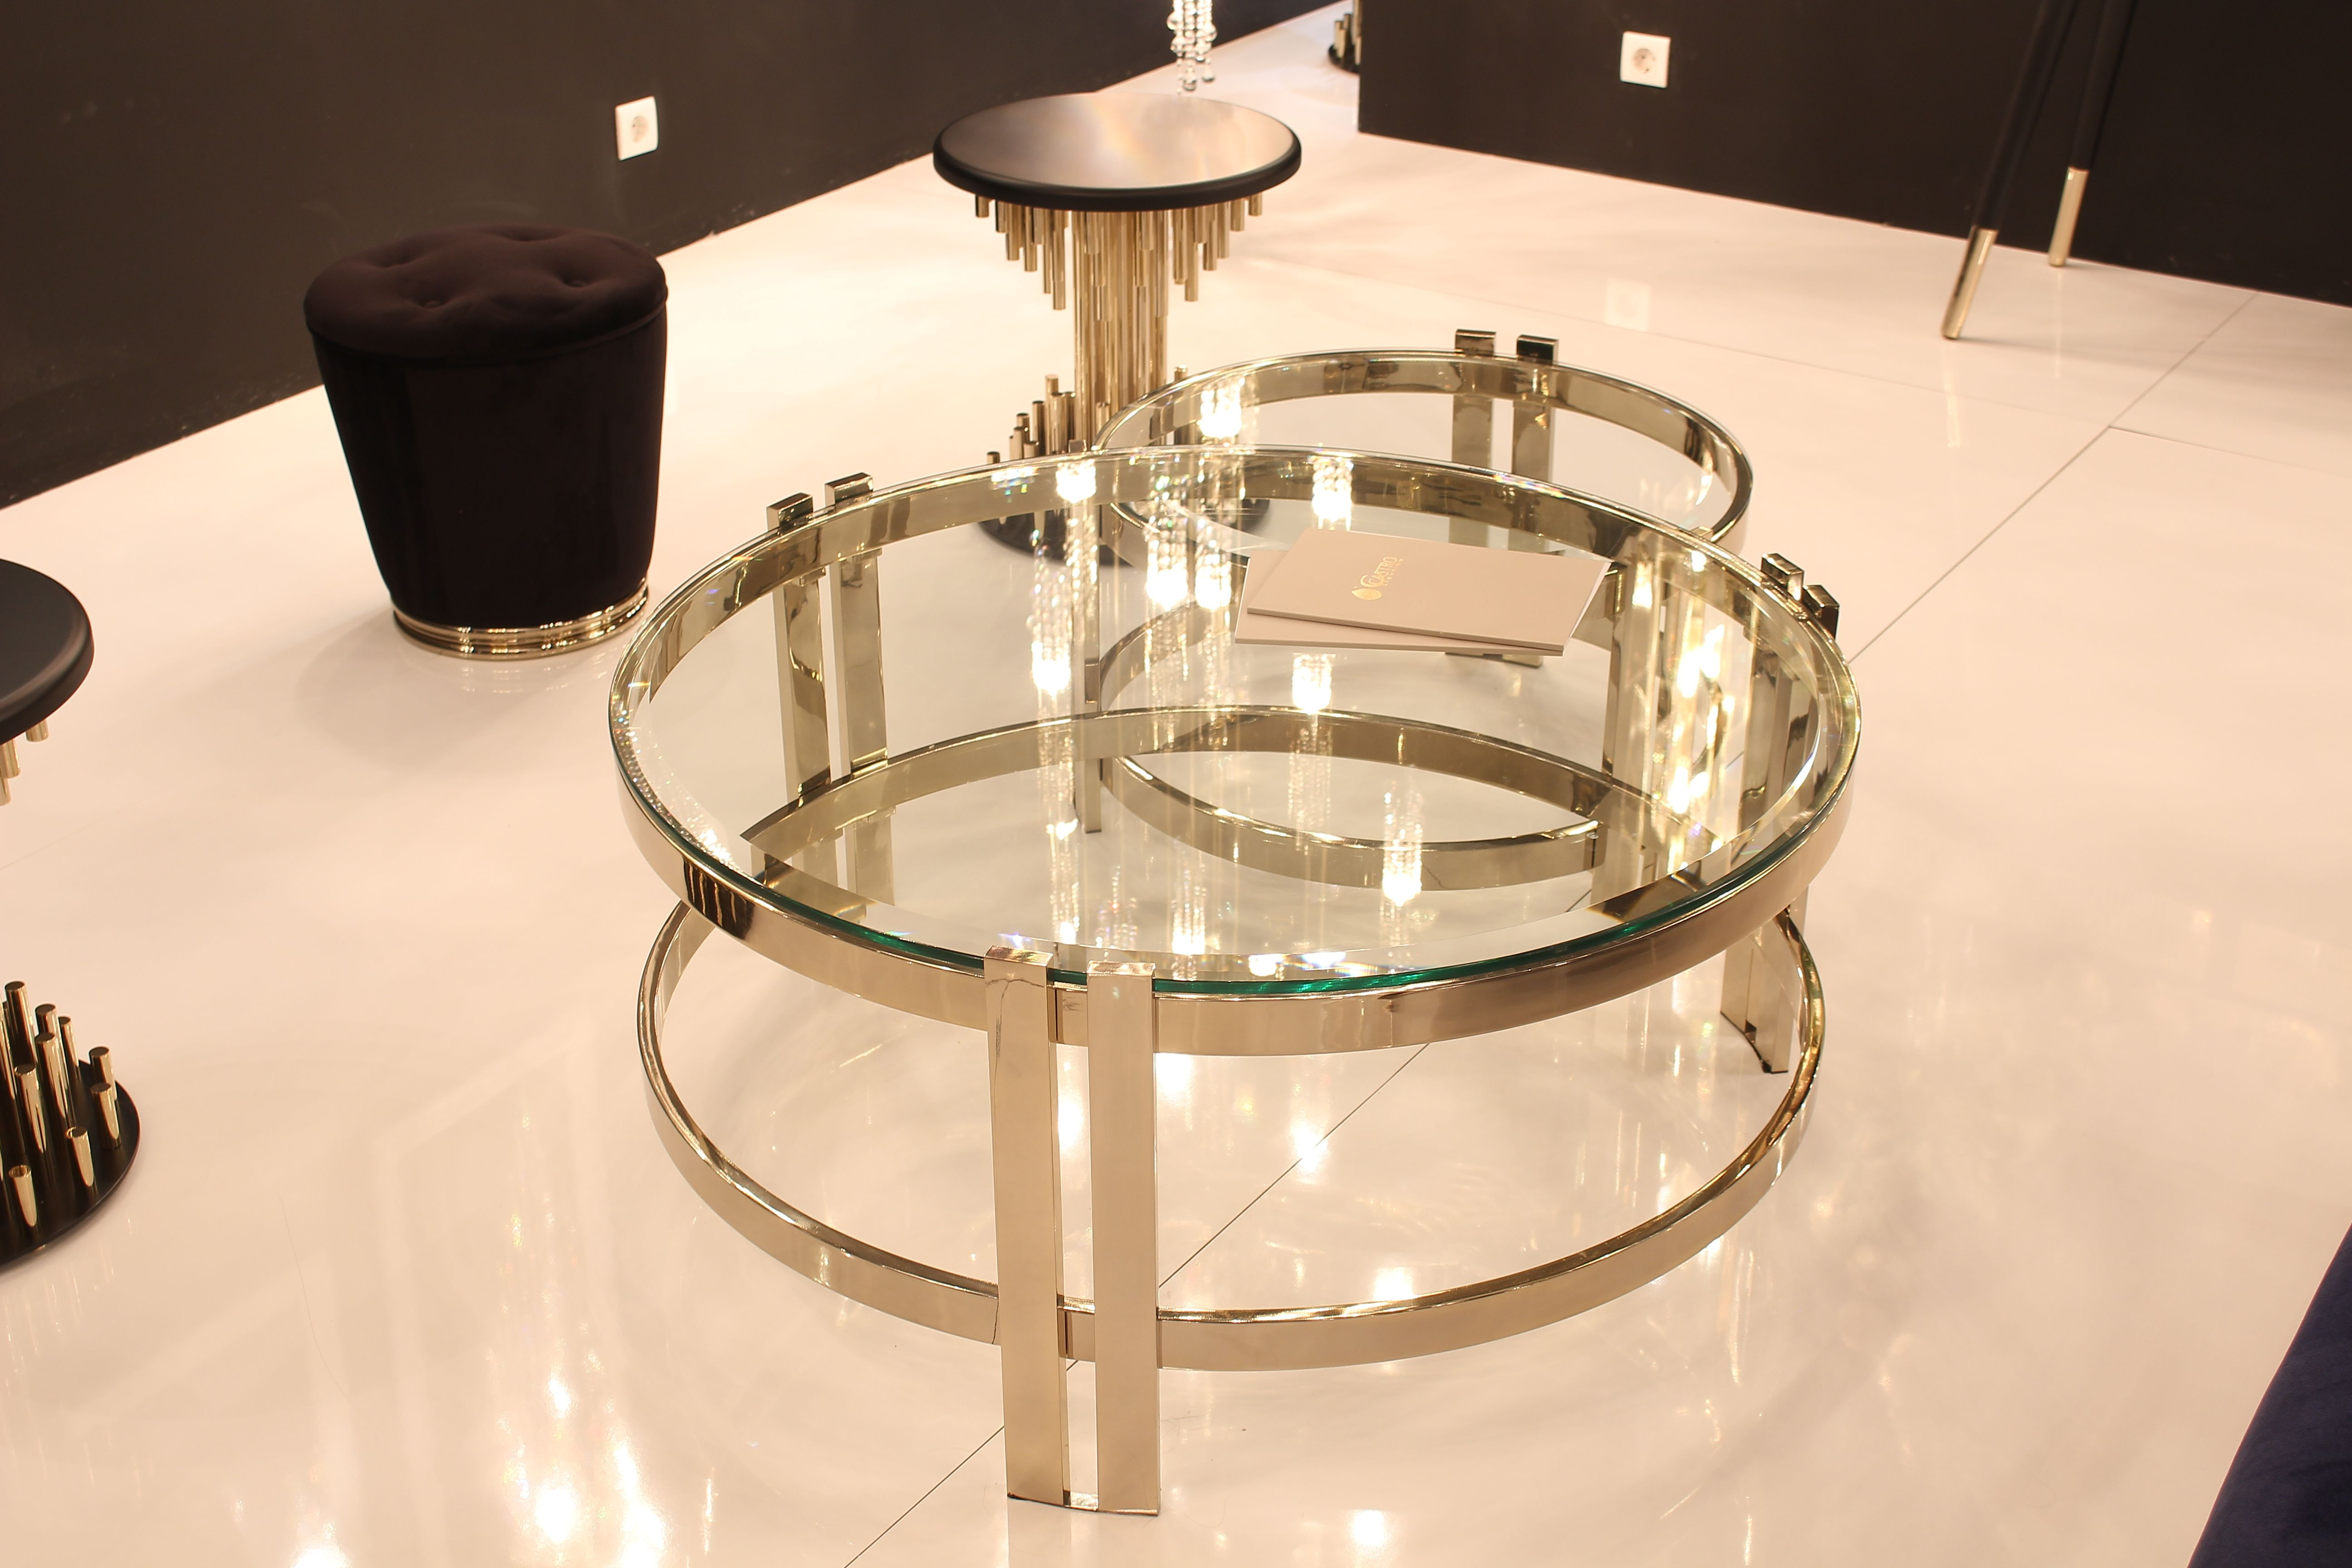 Decor Gold Luxury Fair Lighting Castro Lighting Lifestyle Black White Blue Fashion Mod Round Glass Coffee Table Brass Dining Table Metal Coffee Table [ 3456 x 5184 Pixel ]